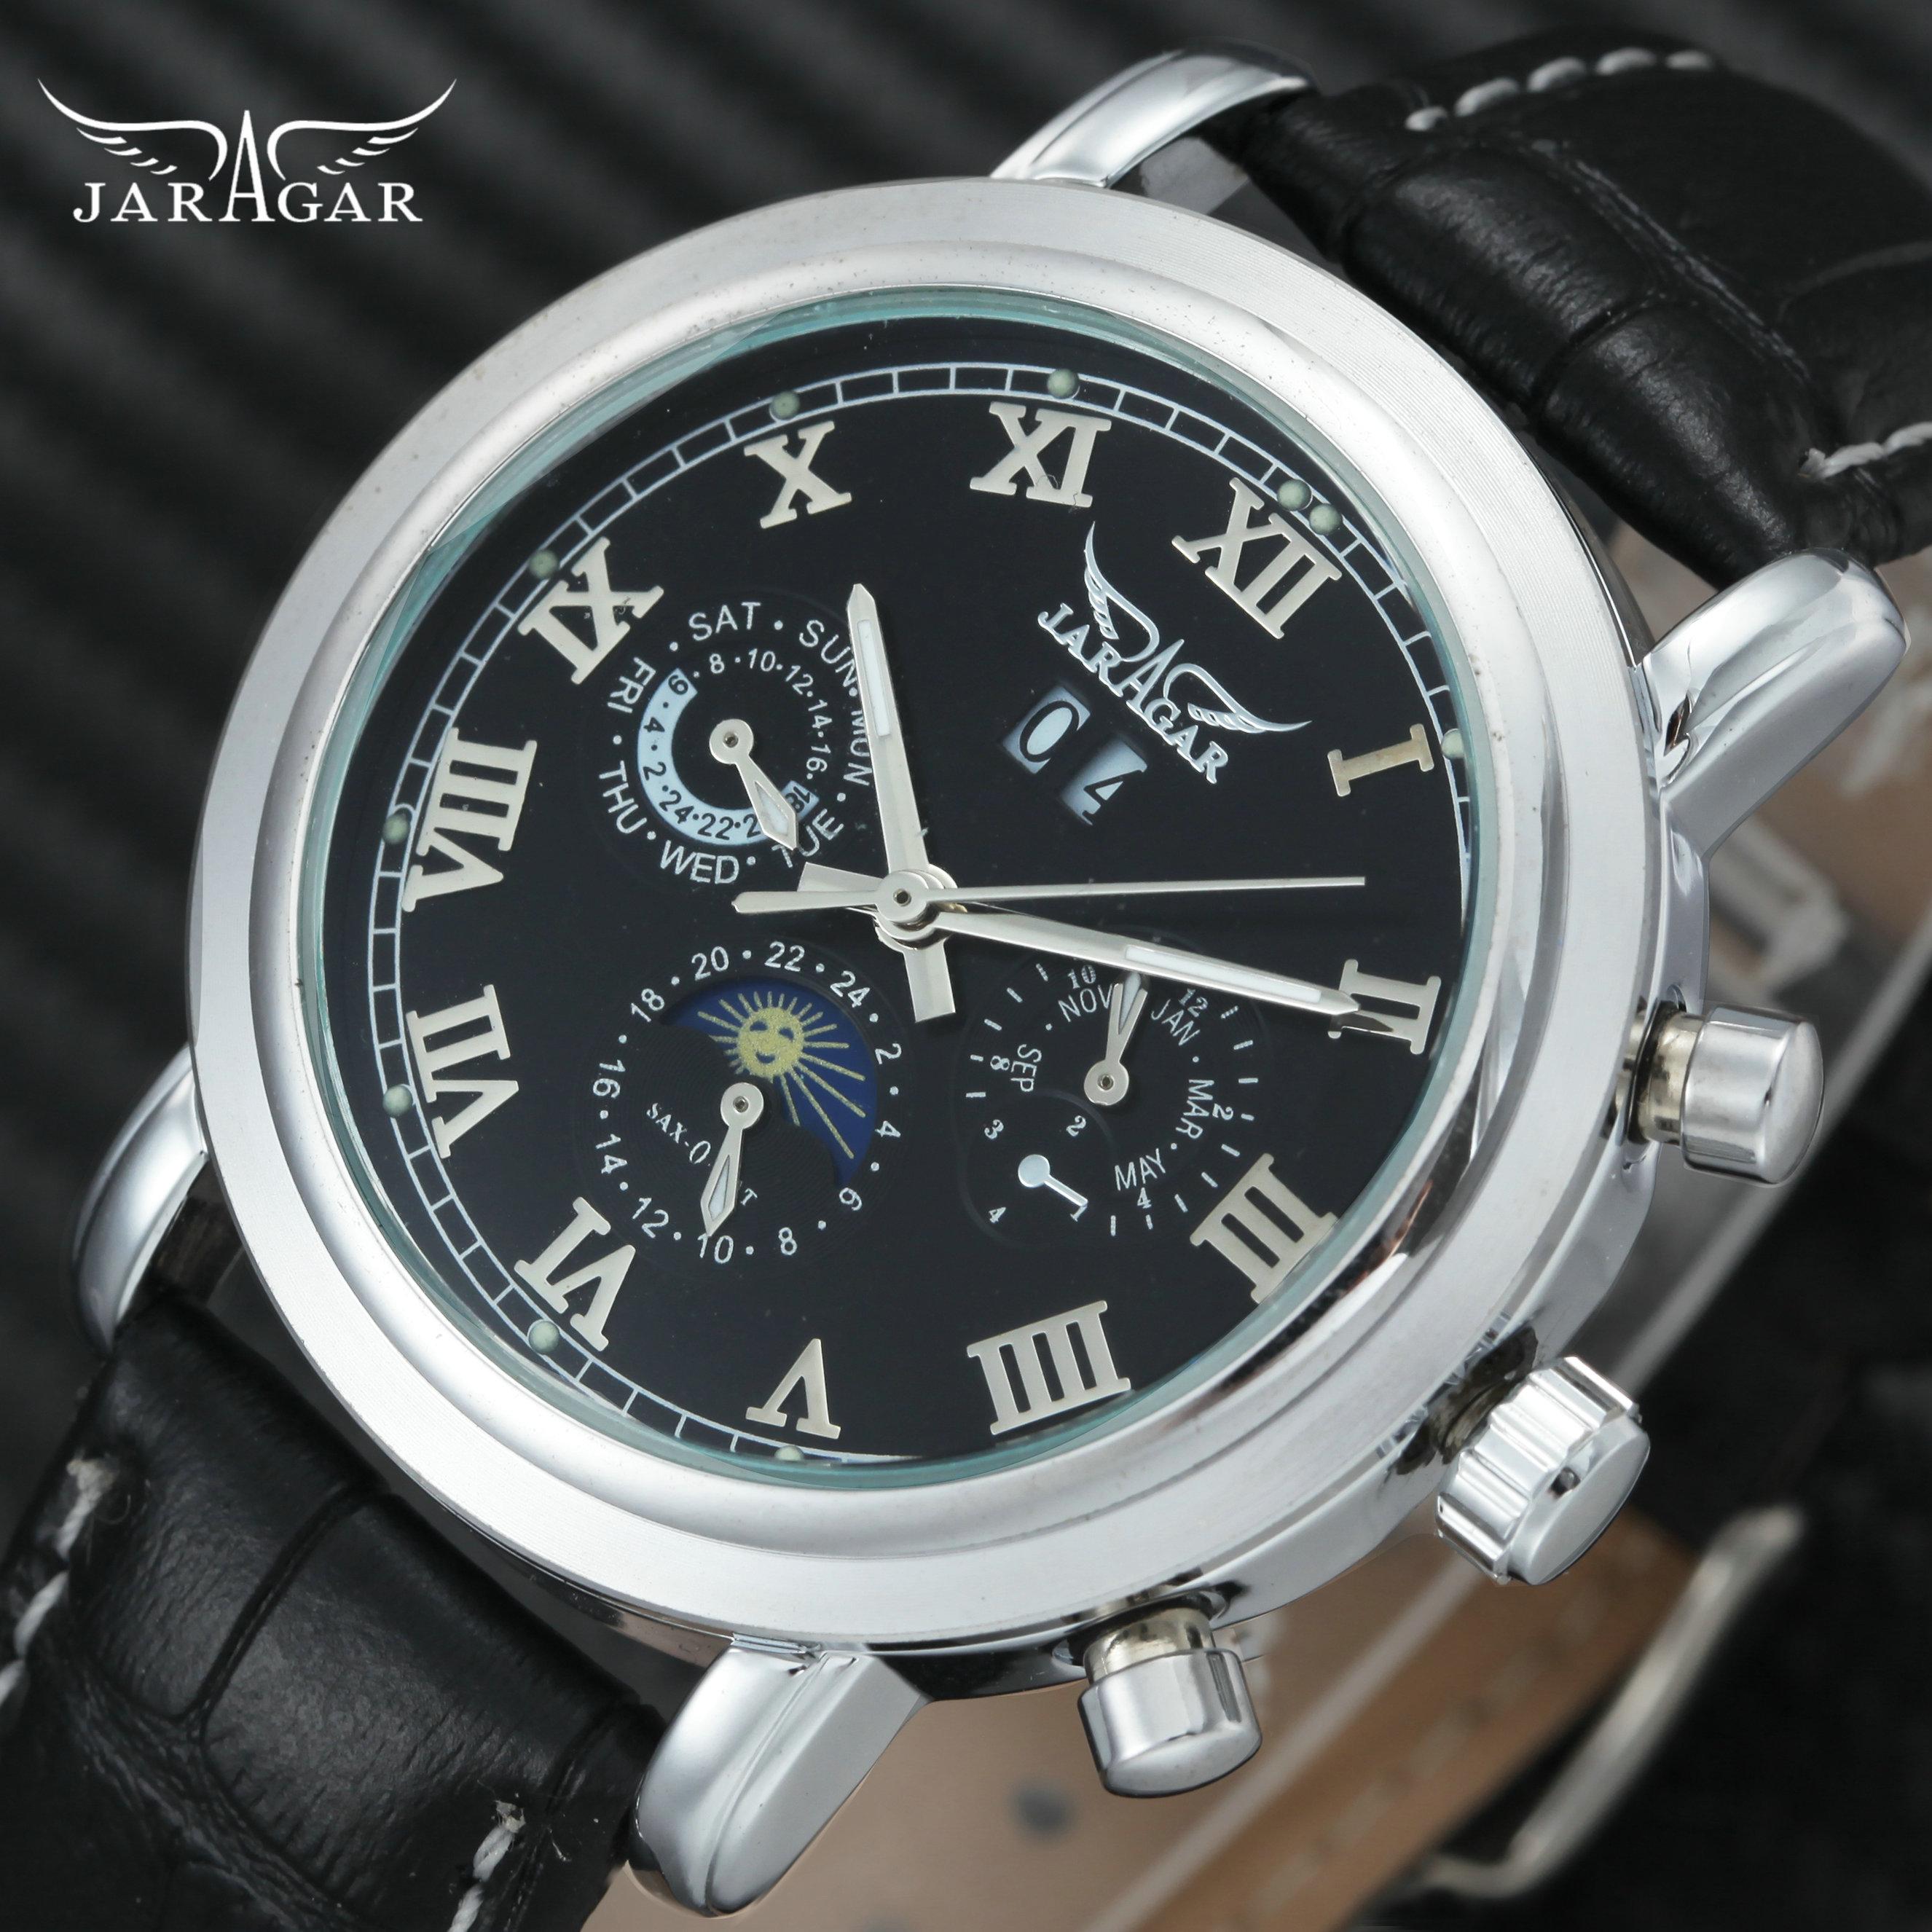 цена на JARAGAR 2018 Mens Watches Top Brand Luxury Sun Moon Display 3 Sub-dial Calendar Fashion Dress Leather Strap Wrist Watch Men 2018